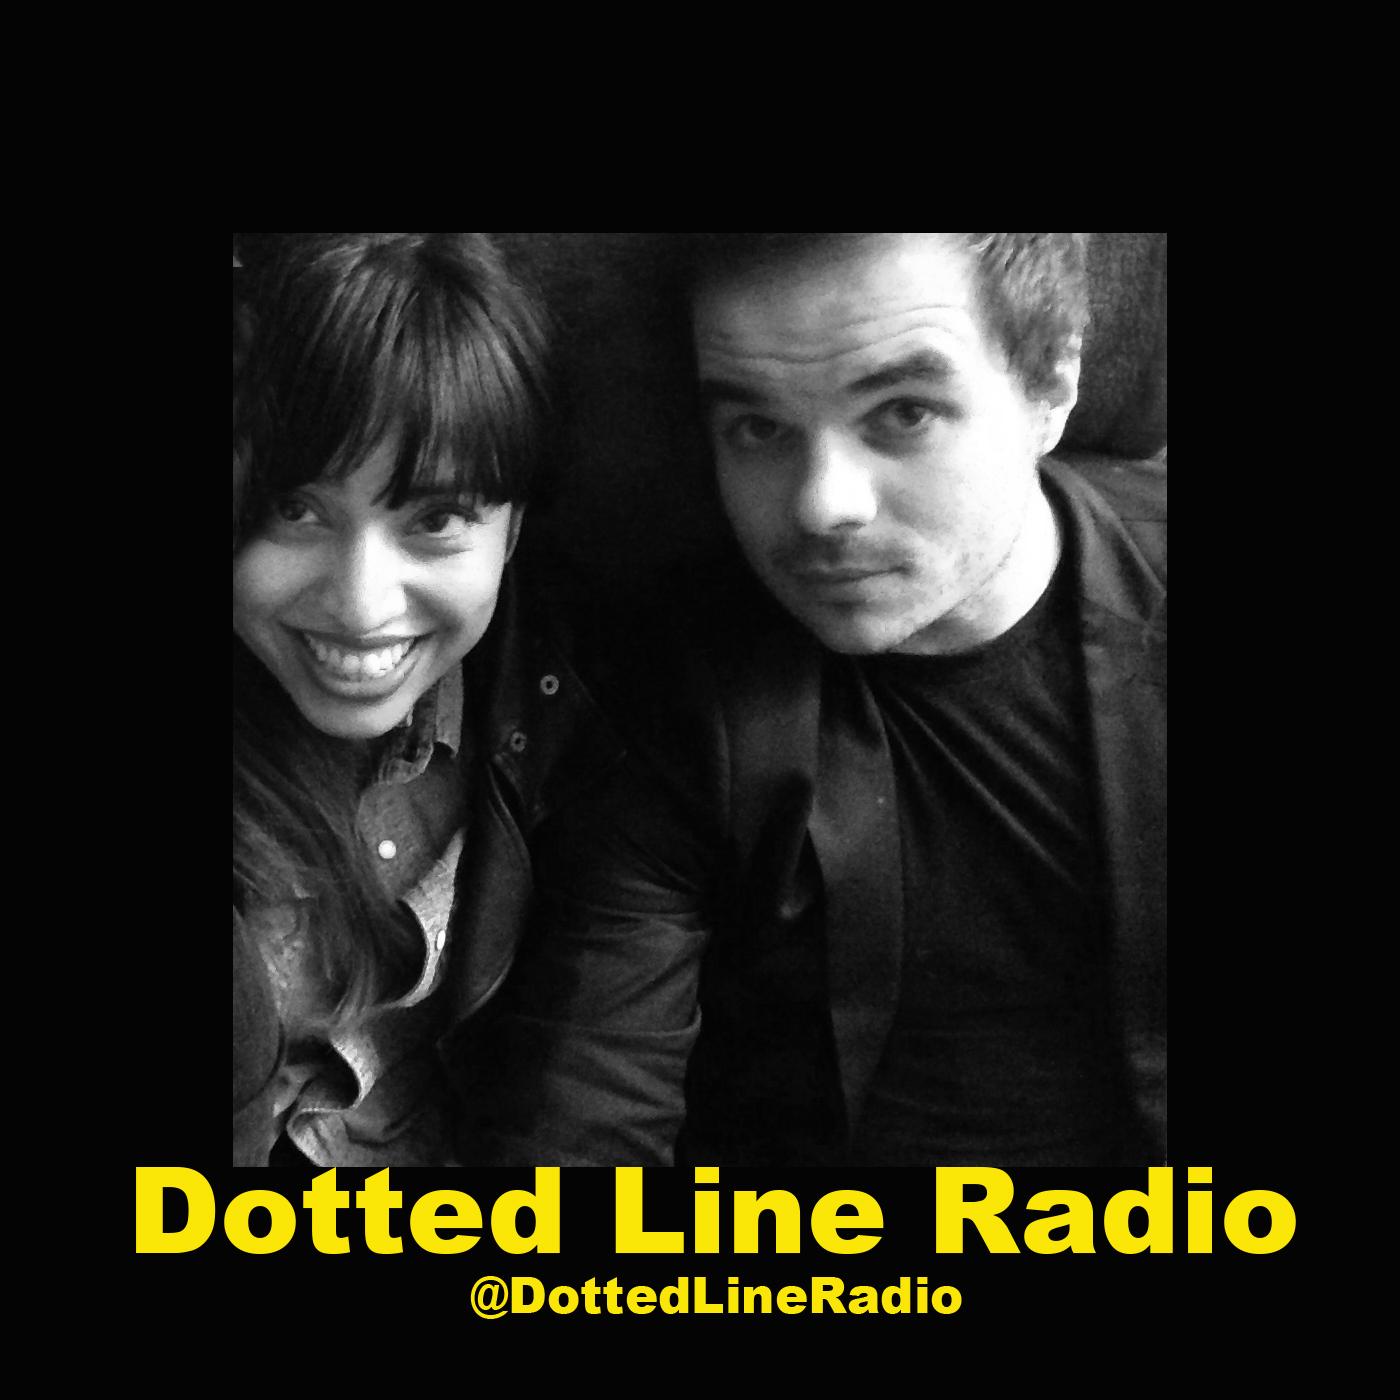 Dotted Line Radio